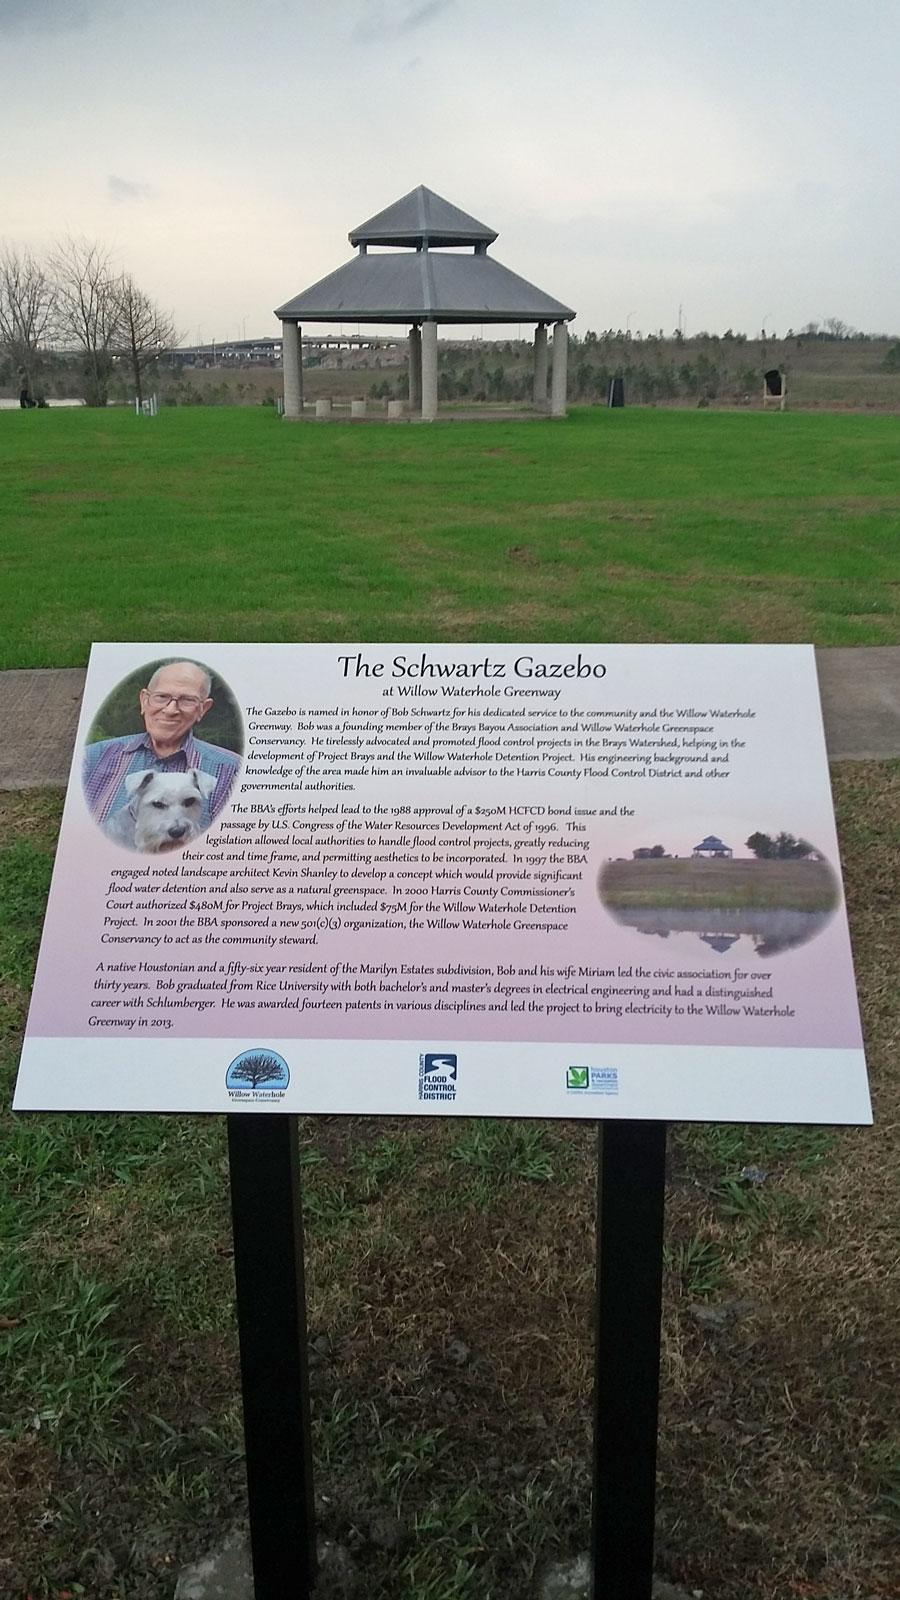 the schwartz gazebo commemorative plaque pedestal